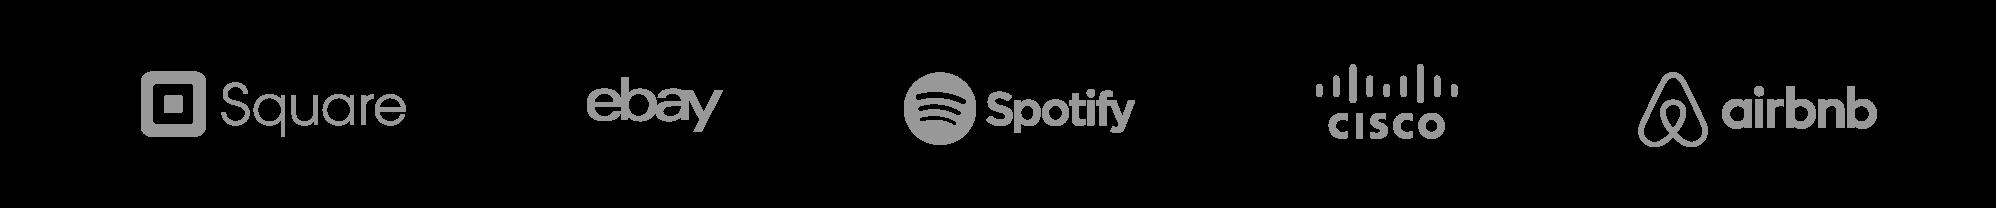 JIRA-Kunden: Square, Ebay, Spotify, Cisco, Airbnb